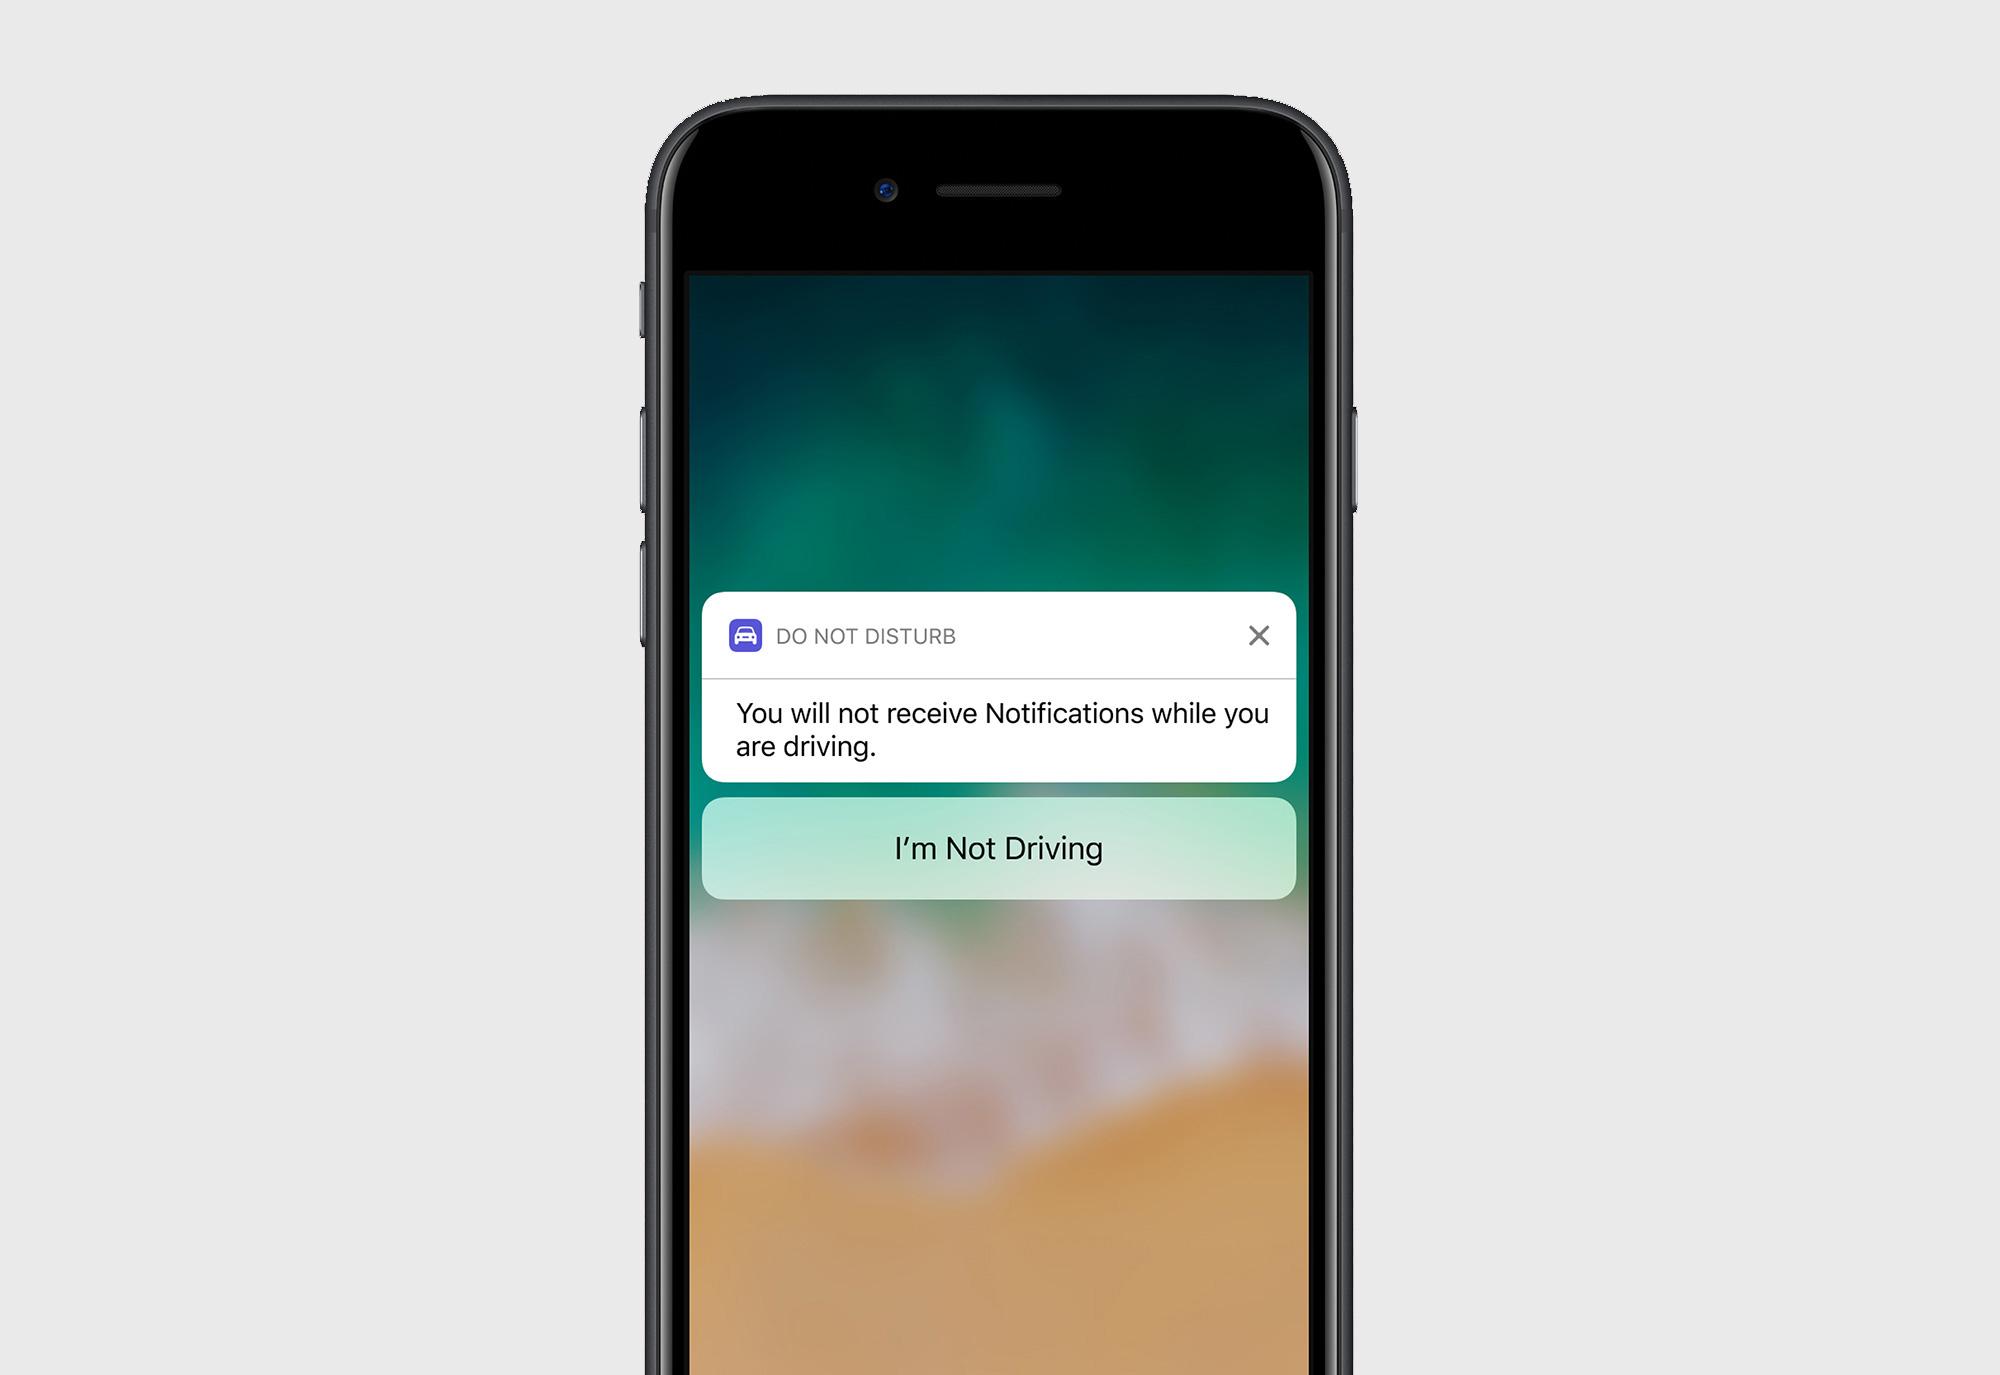 ios_iphone_do_not_disturb_driving_3.jpg